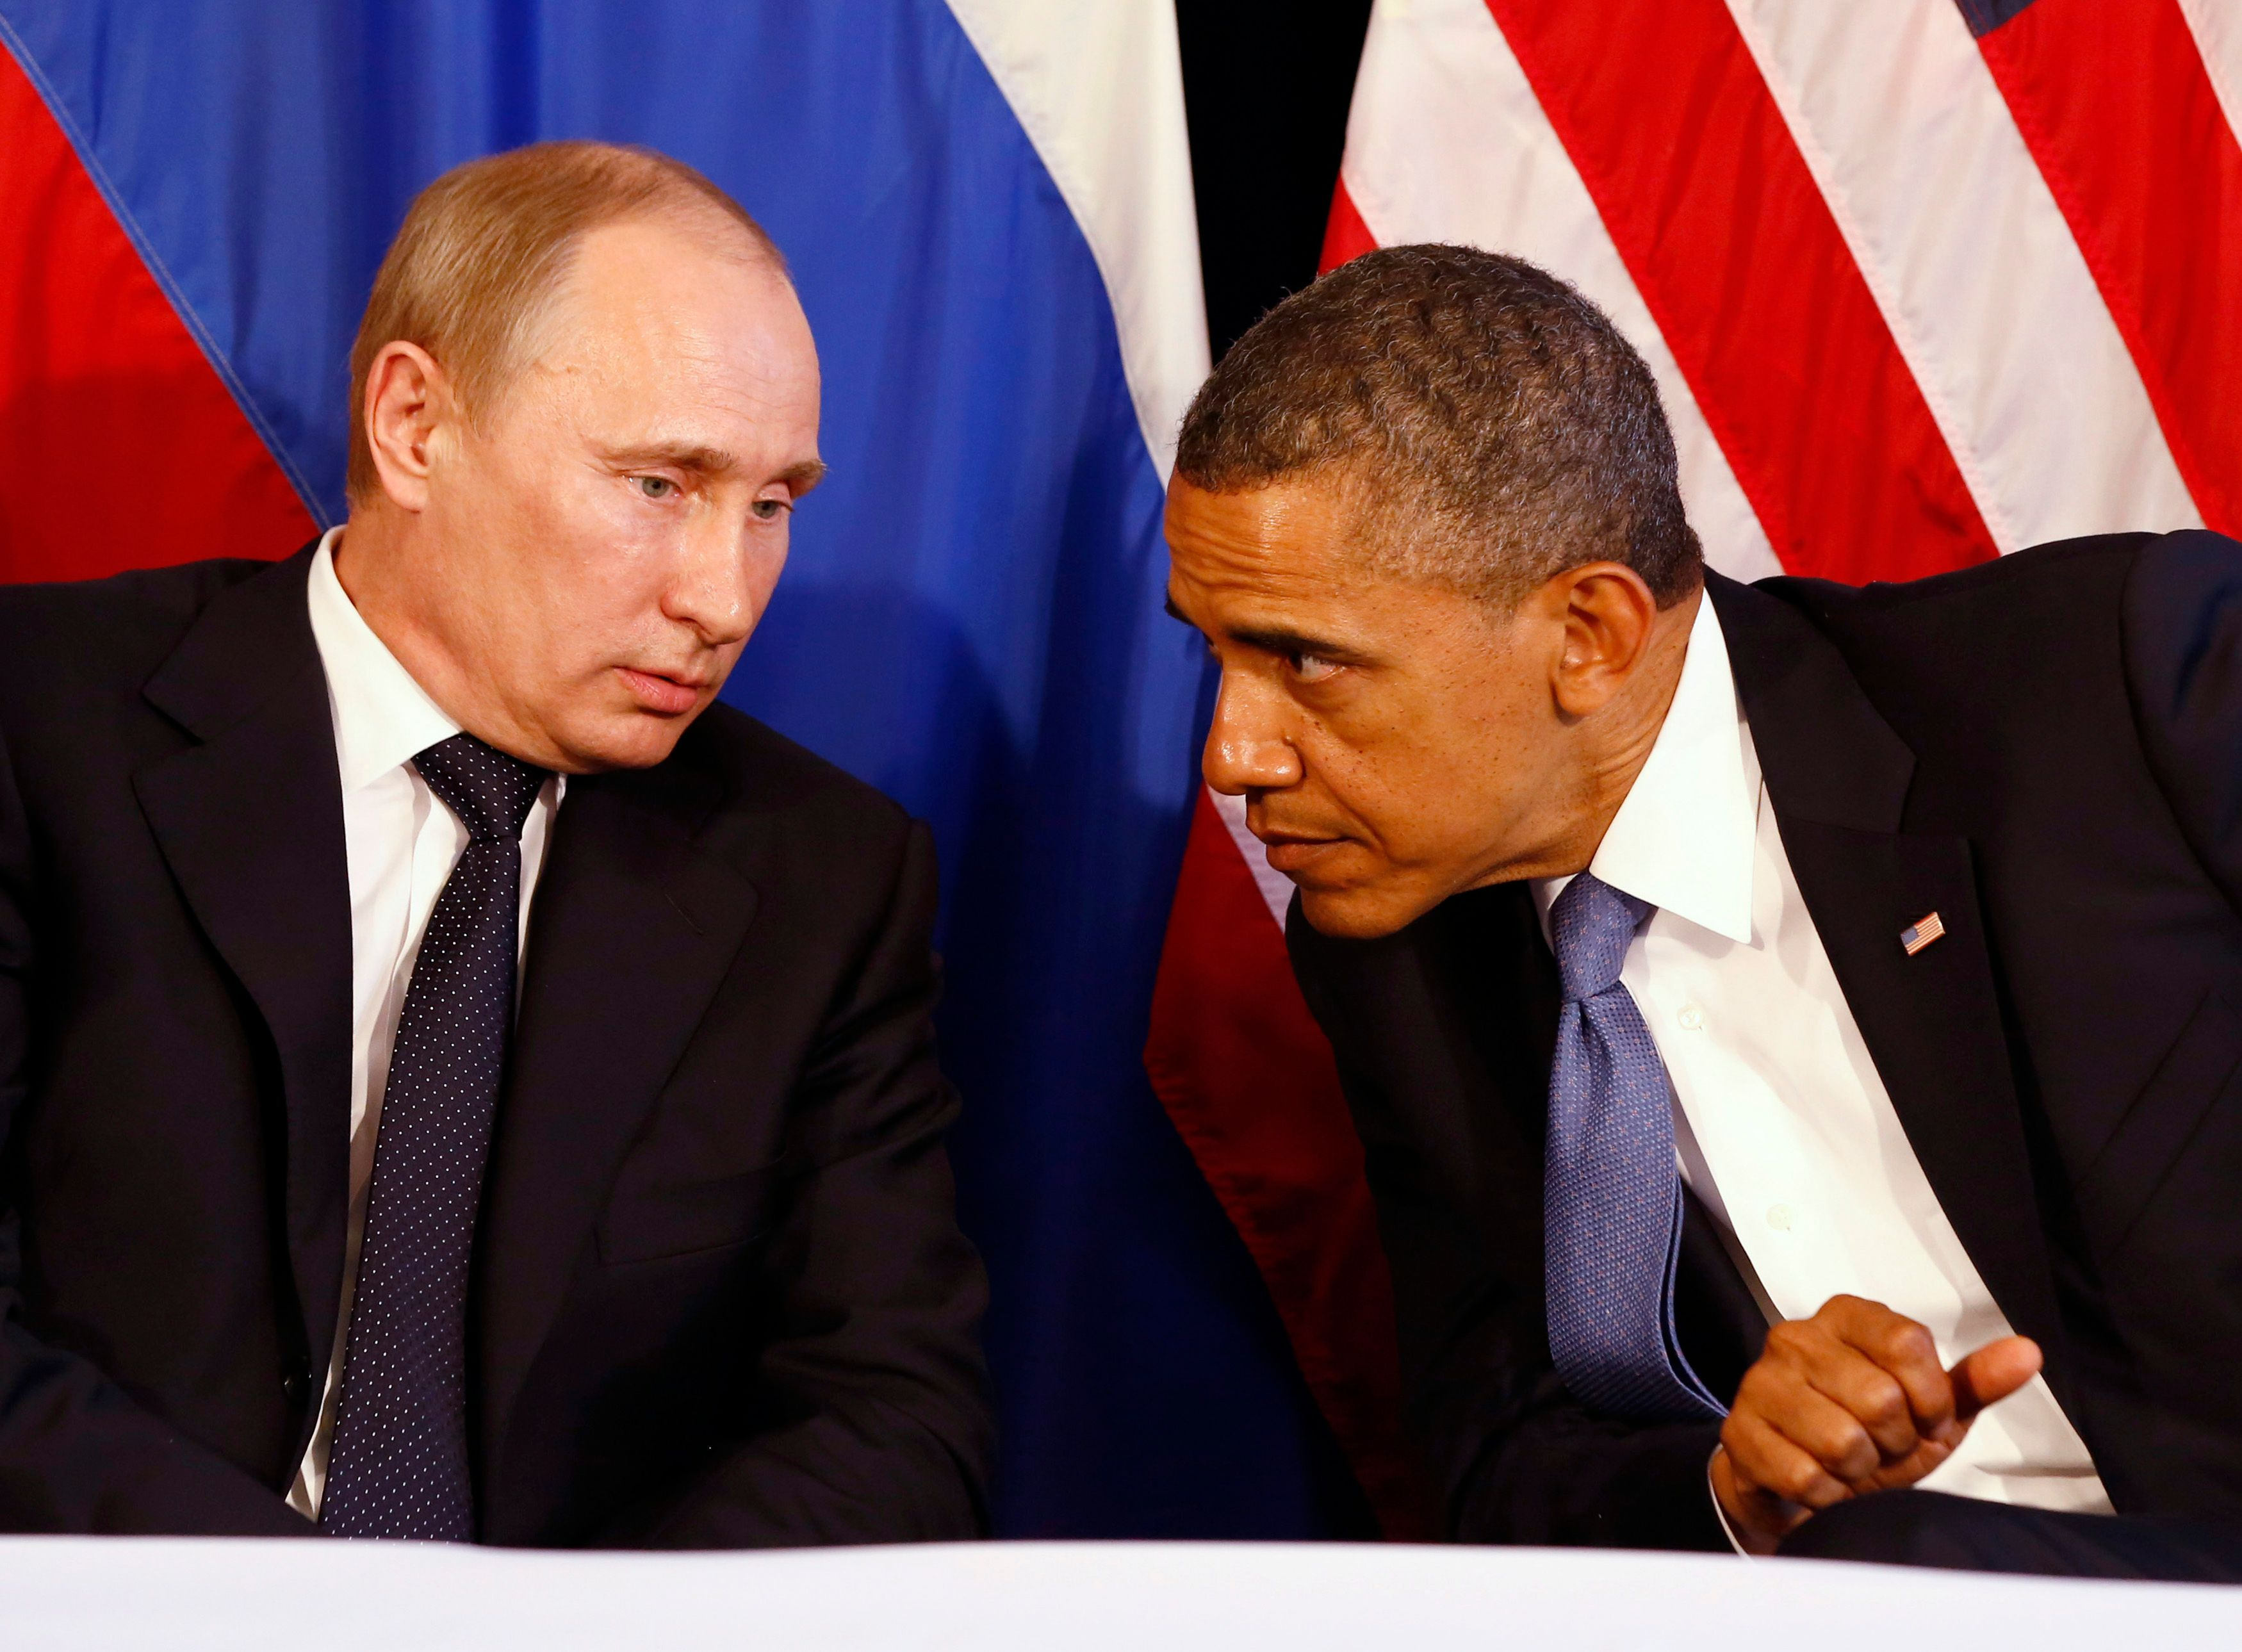 Barack Obama menace de boycotter le prochain G8